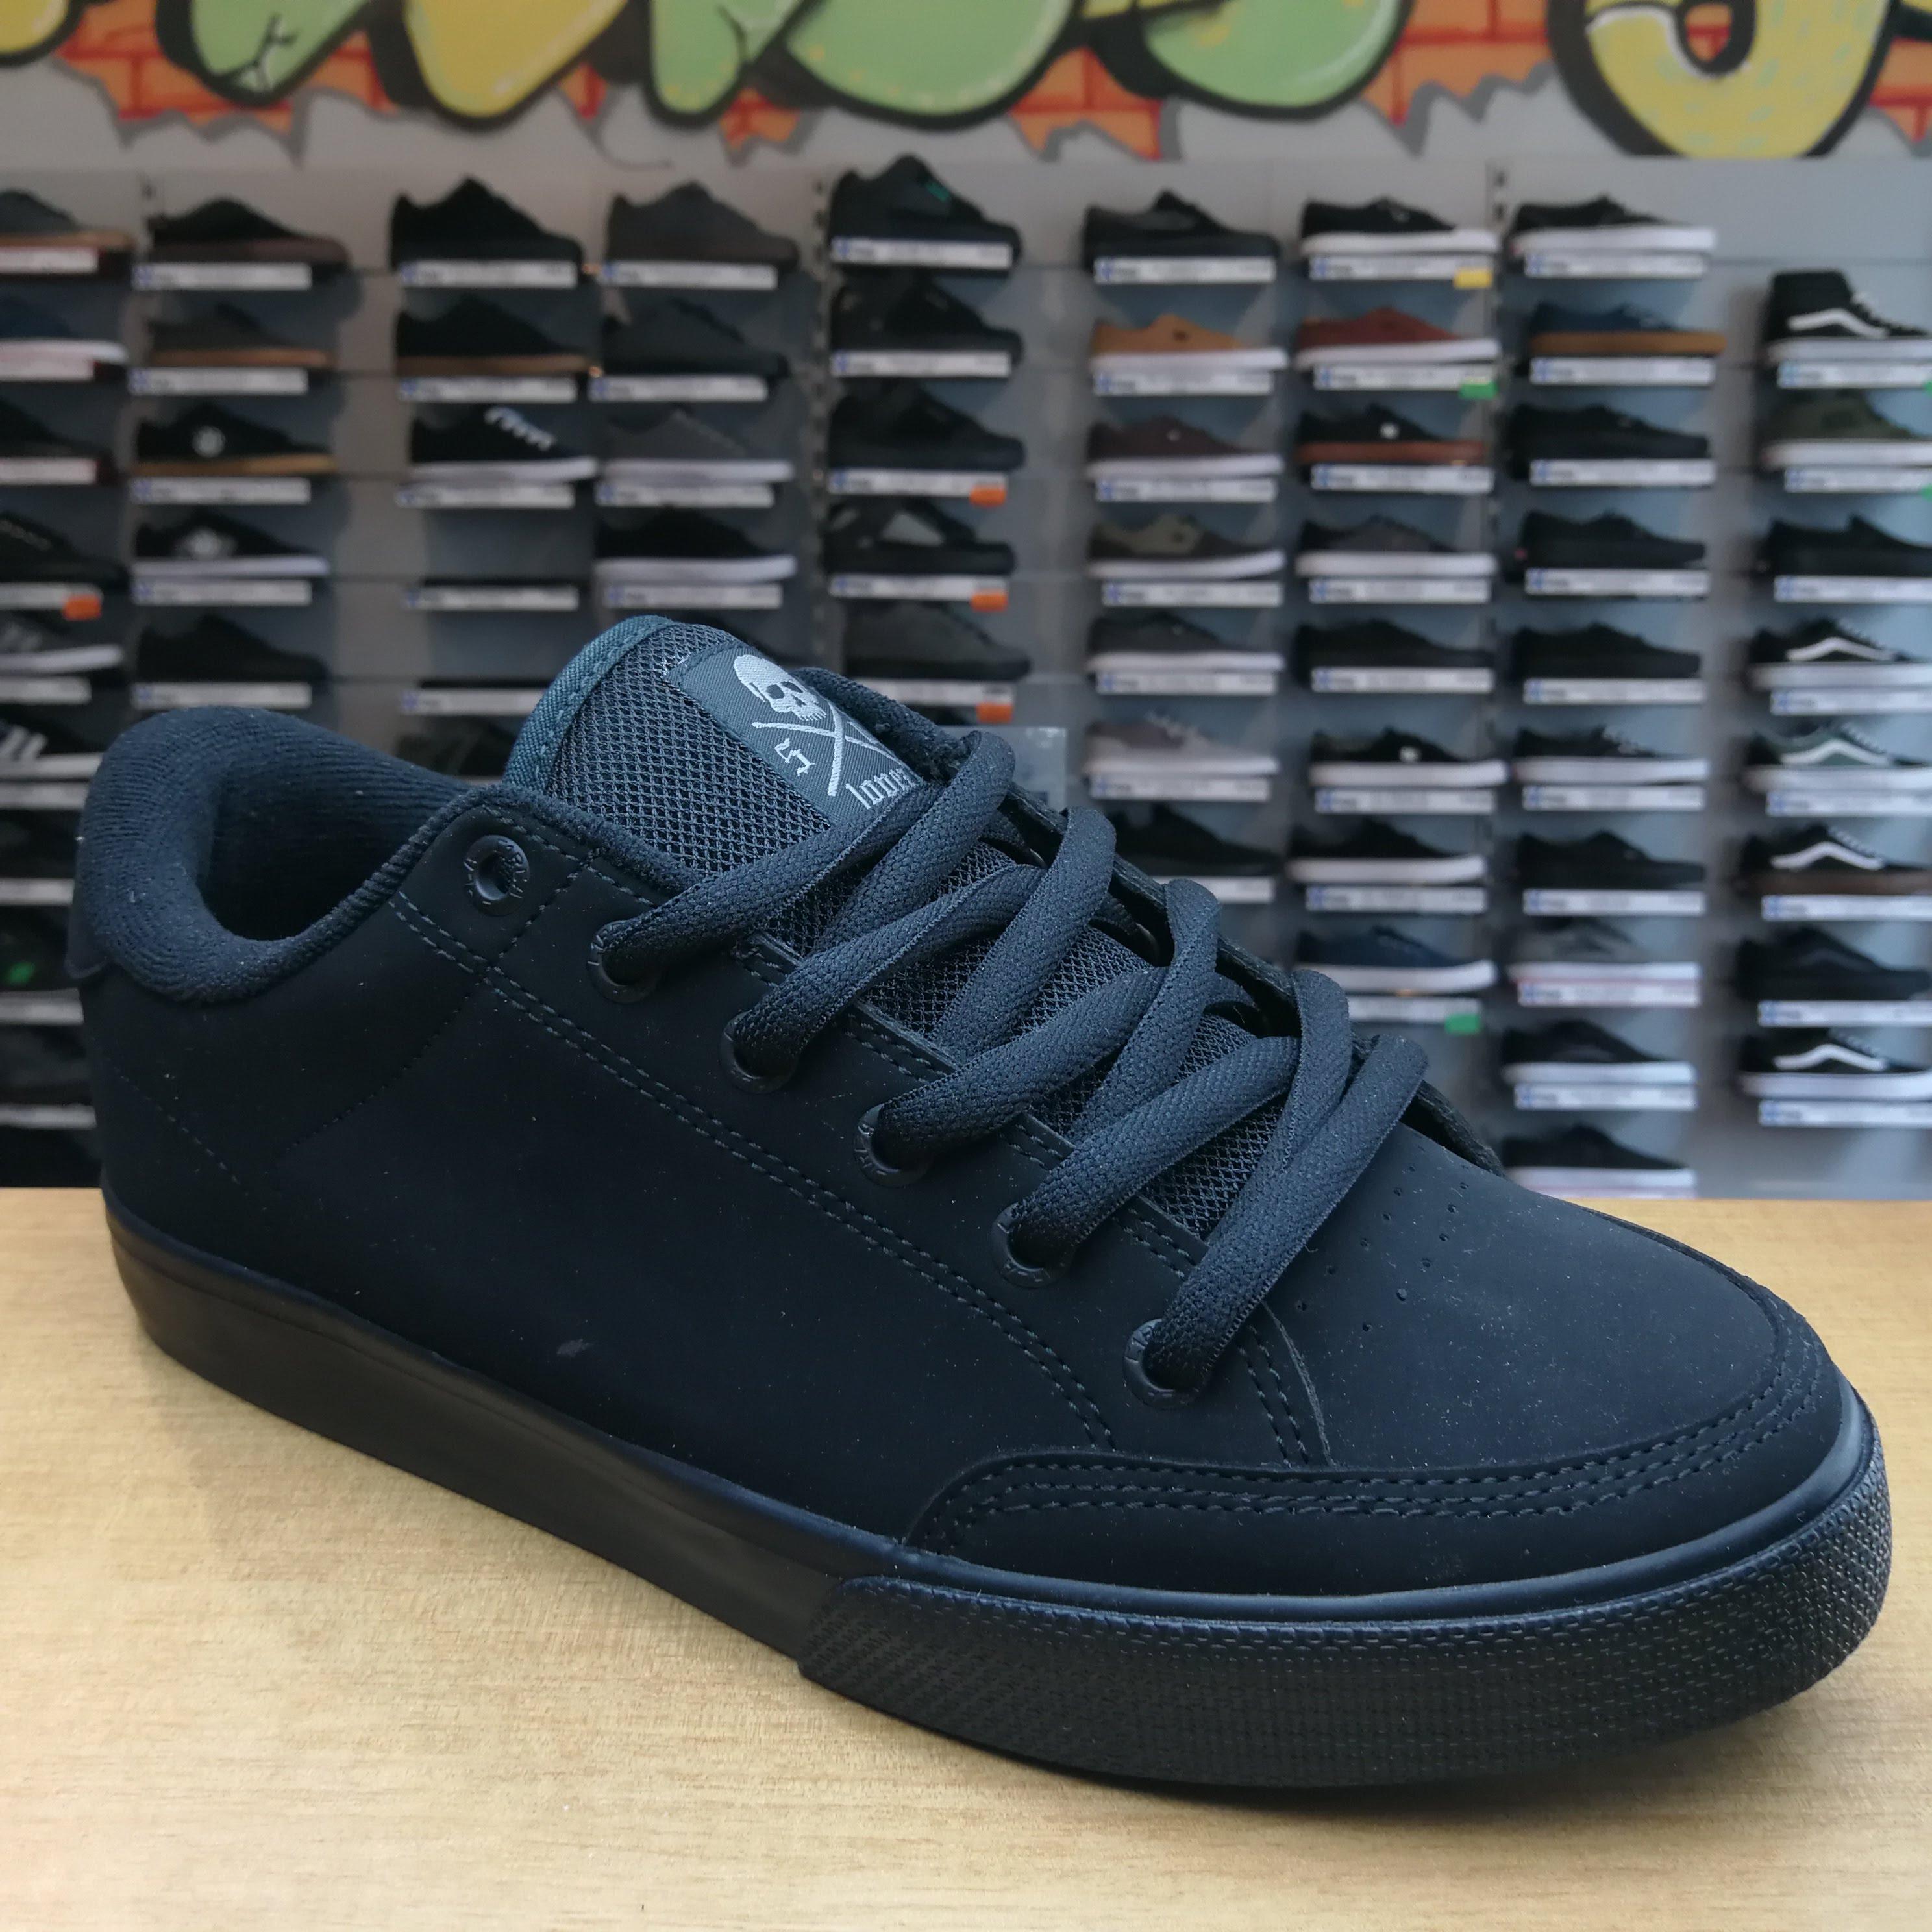 new style d75b6 80304 C1RCA LOPEZ 50 black / black